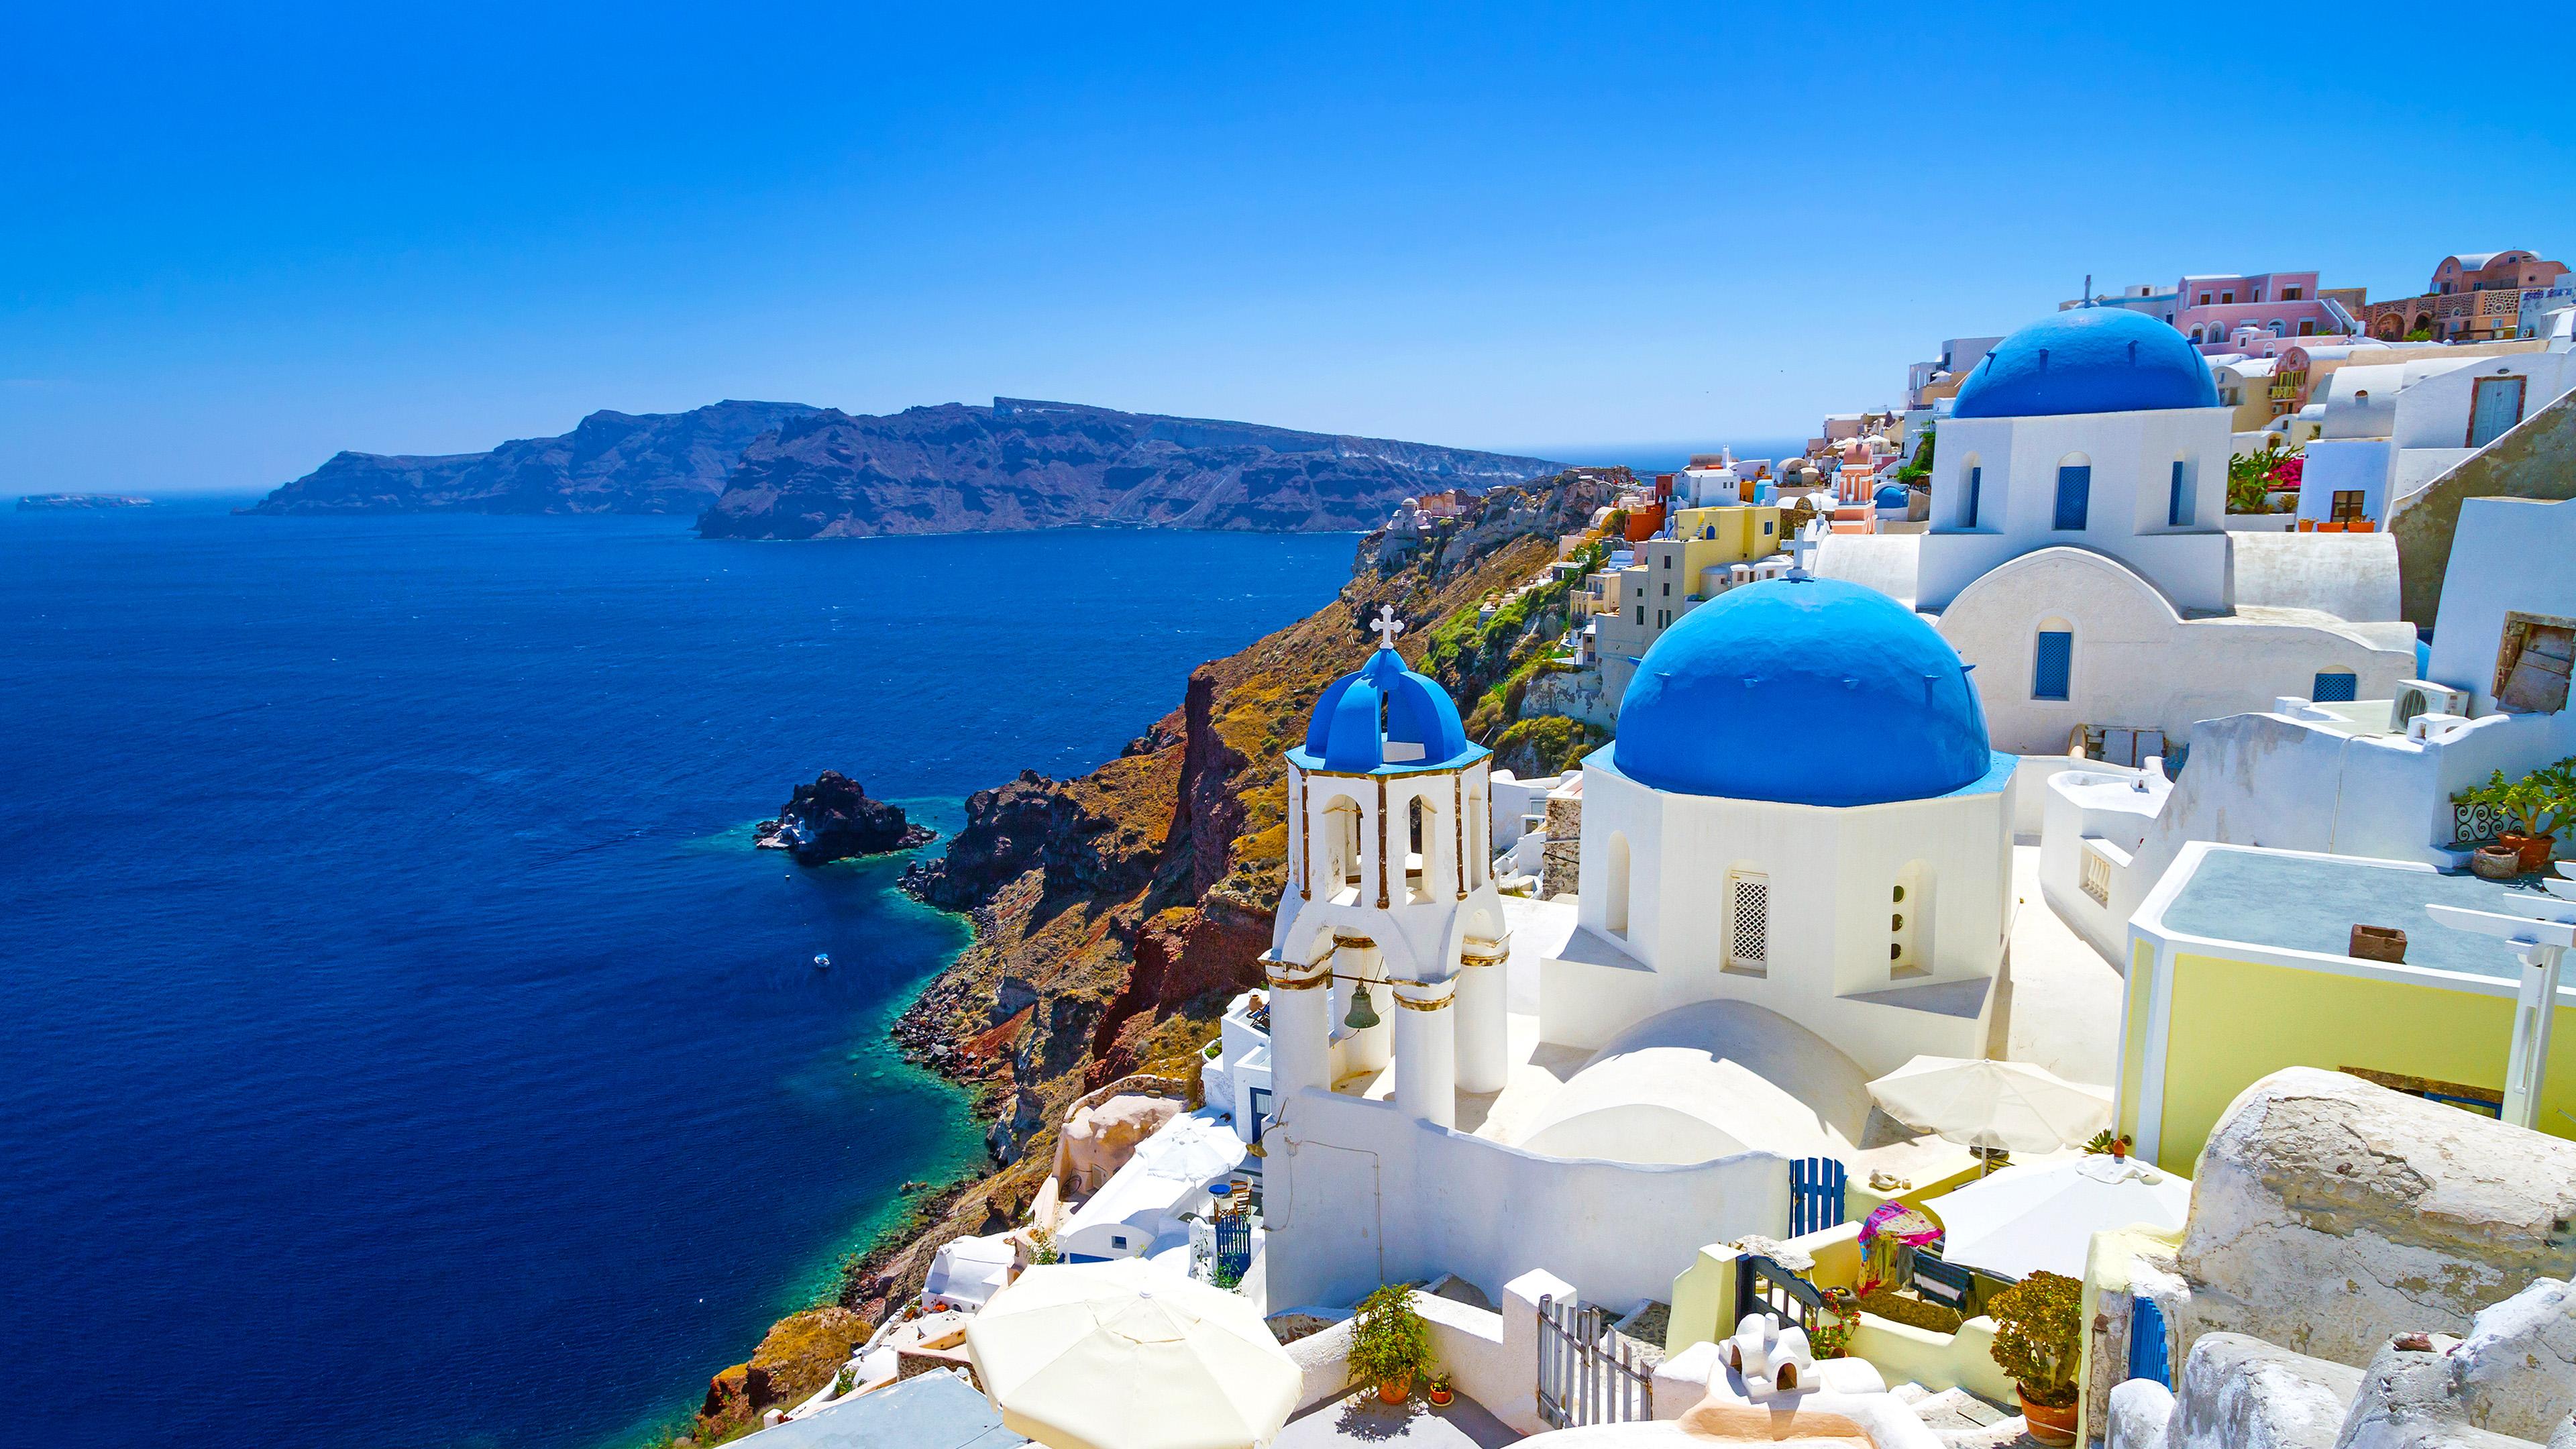 Santorini Cyclades Islands Aegean Sea Greece 4K Wallpaper 3840x2160